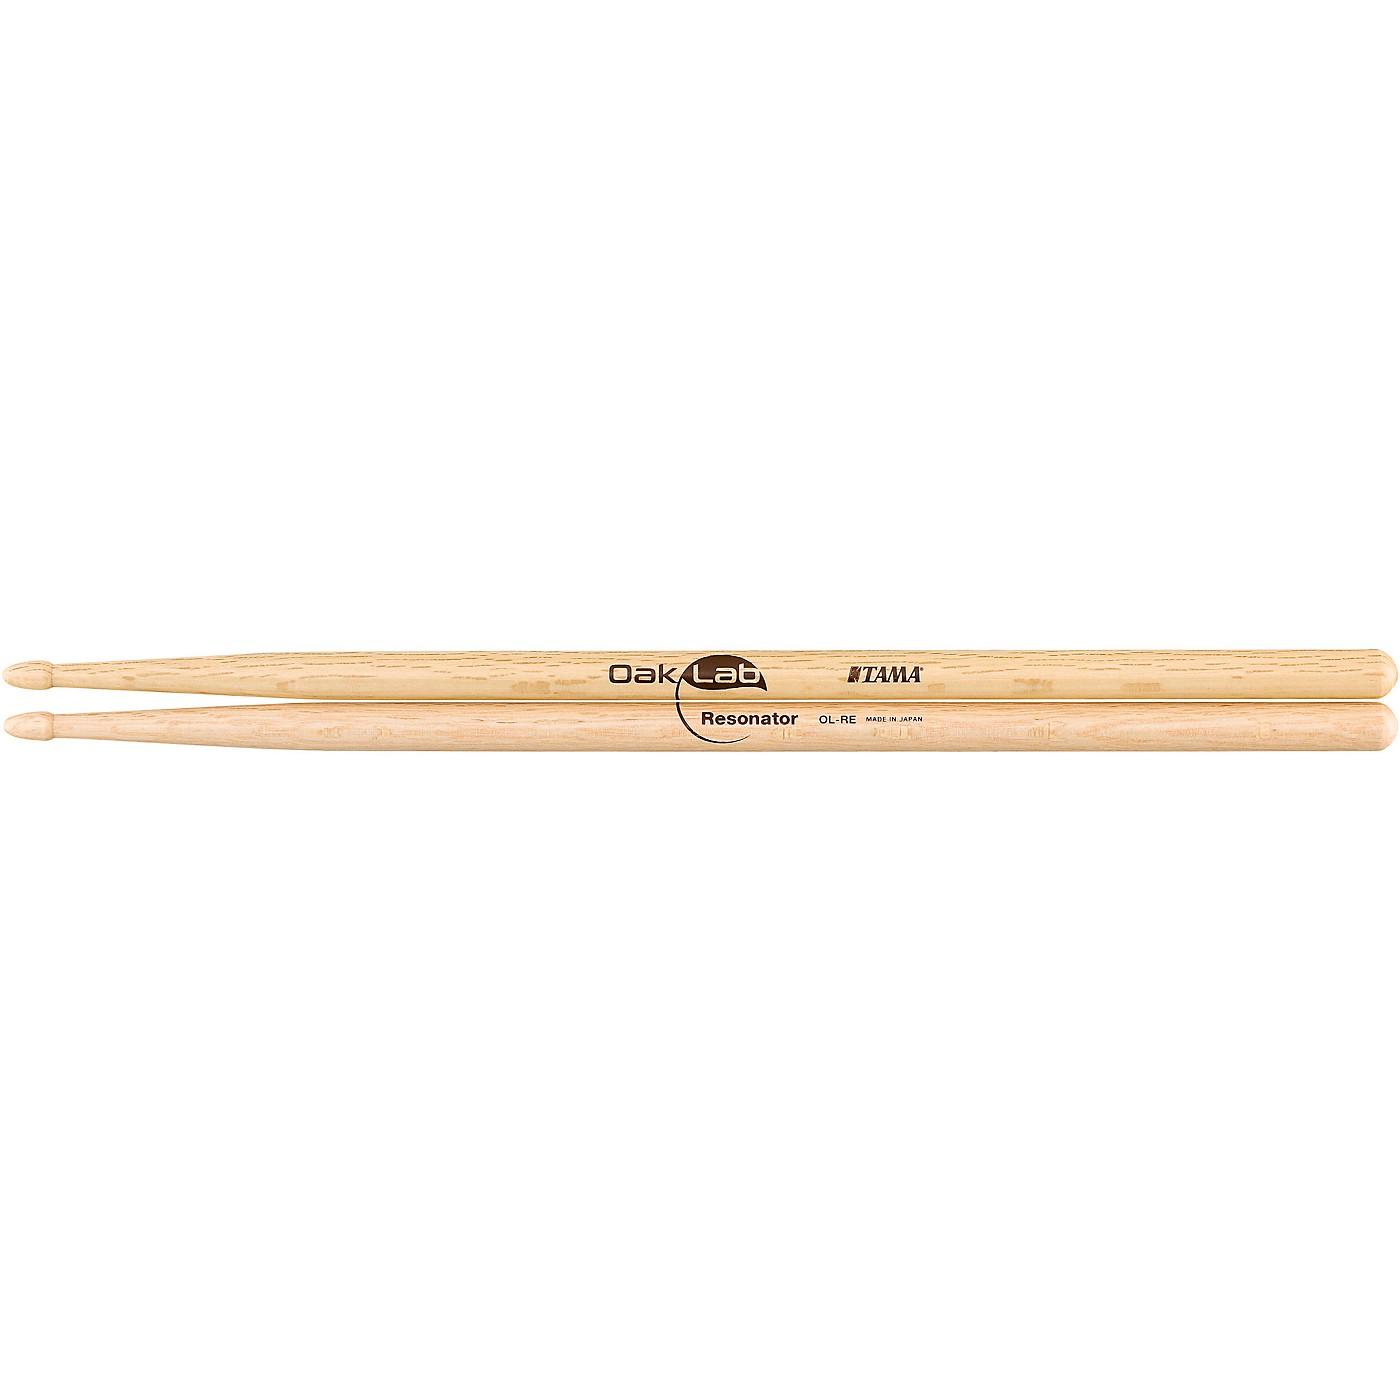 TAMA Oak Lab Series Resonator Drum Sticks thumbnail